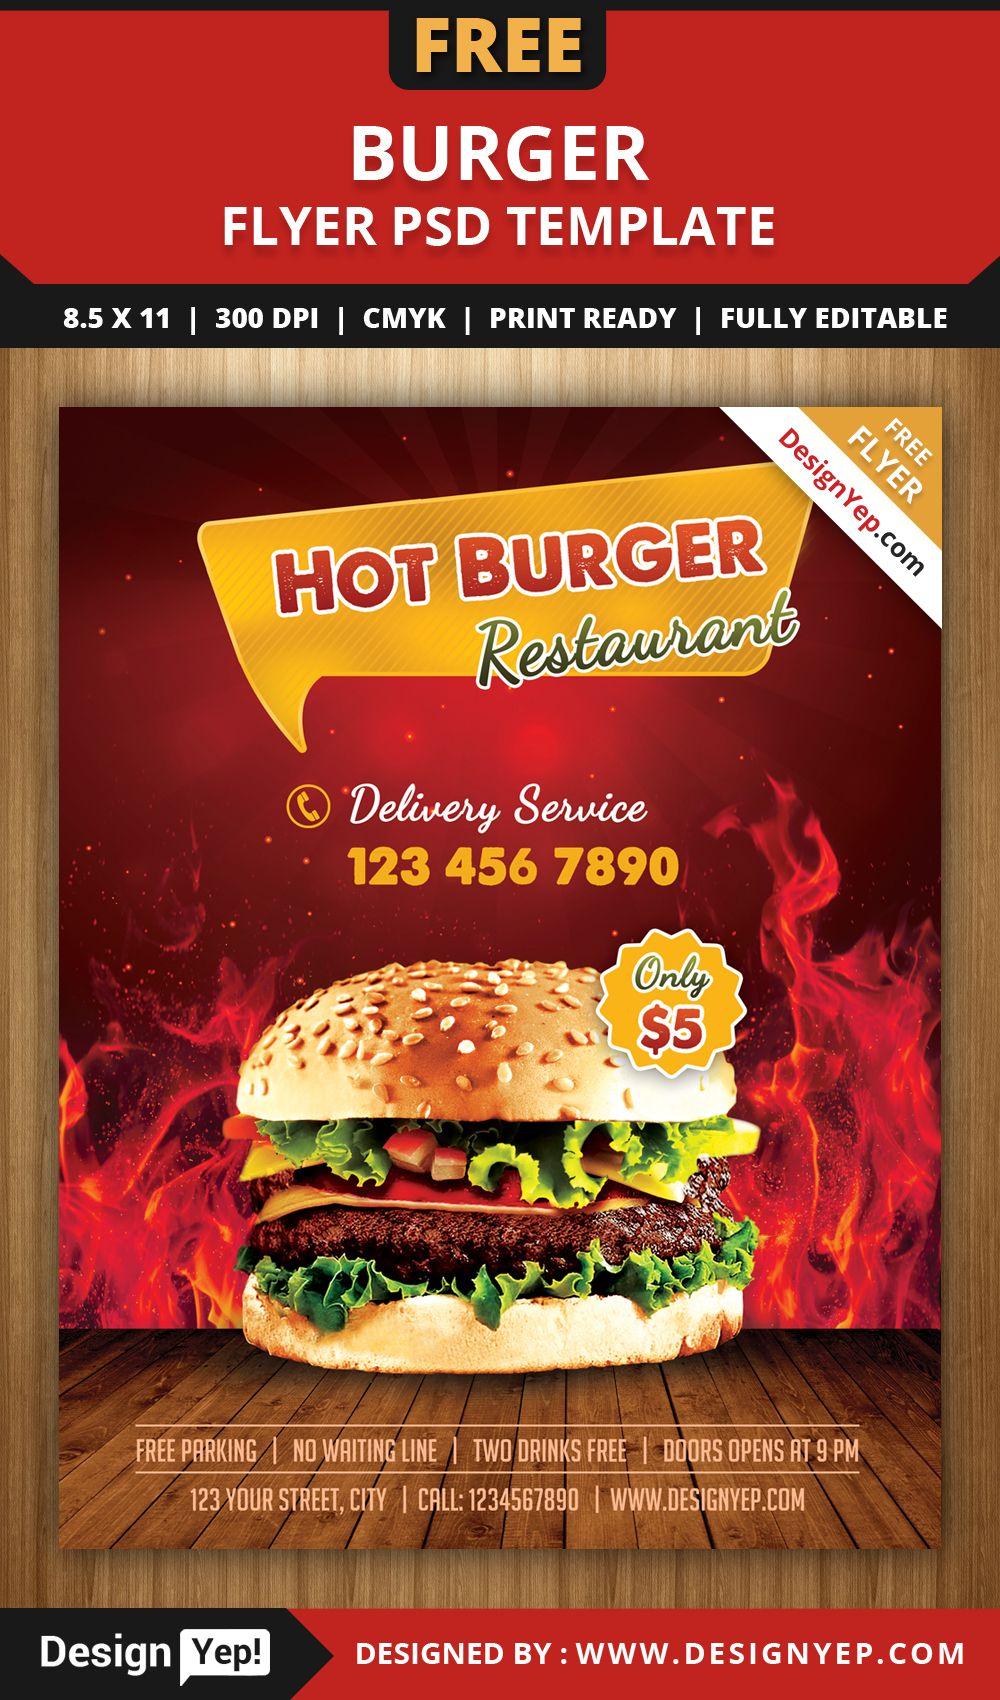 Free Burger Shop Flyer PSD Template | Free Flyers | Pinterest